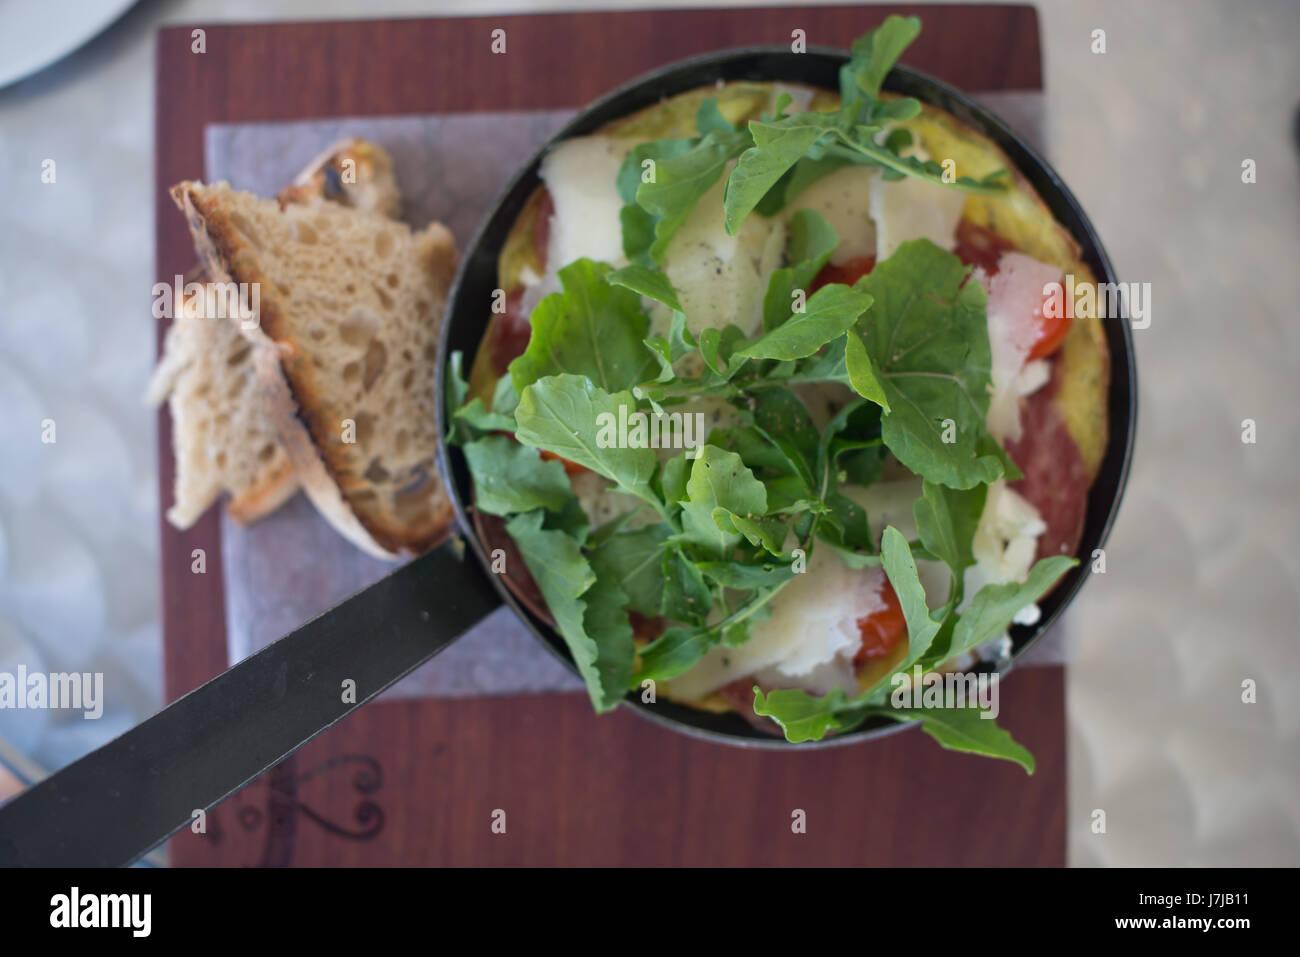 Edible - Stock Image